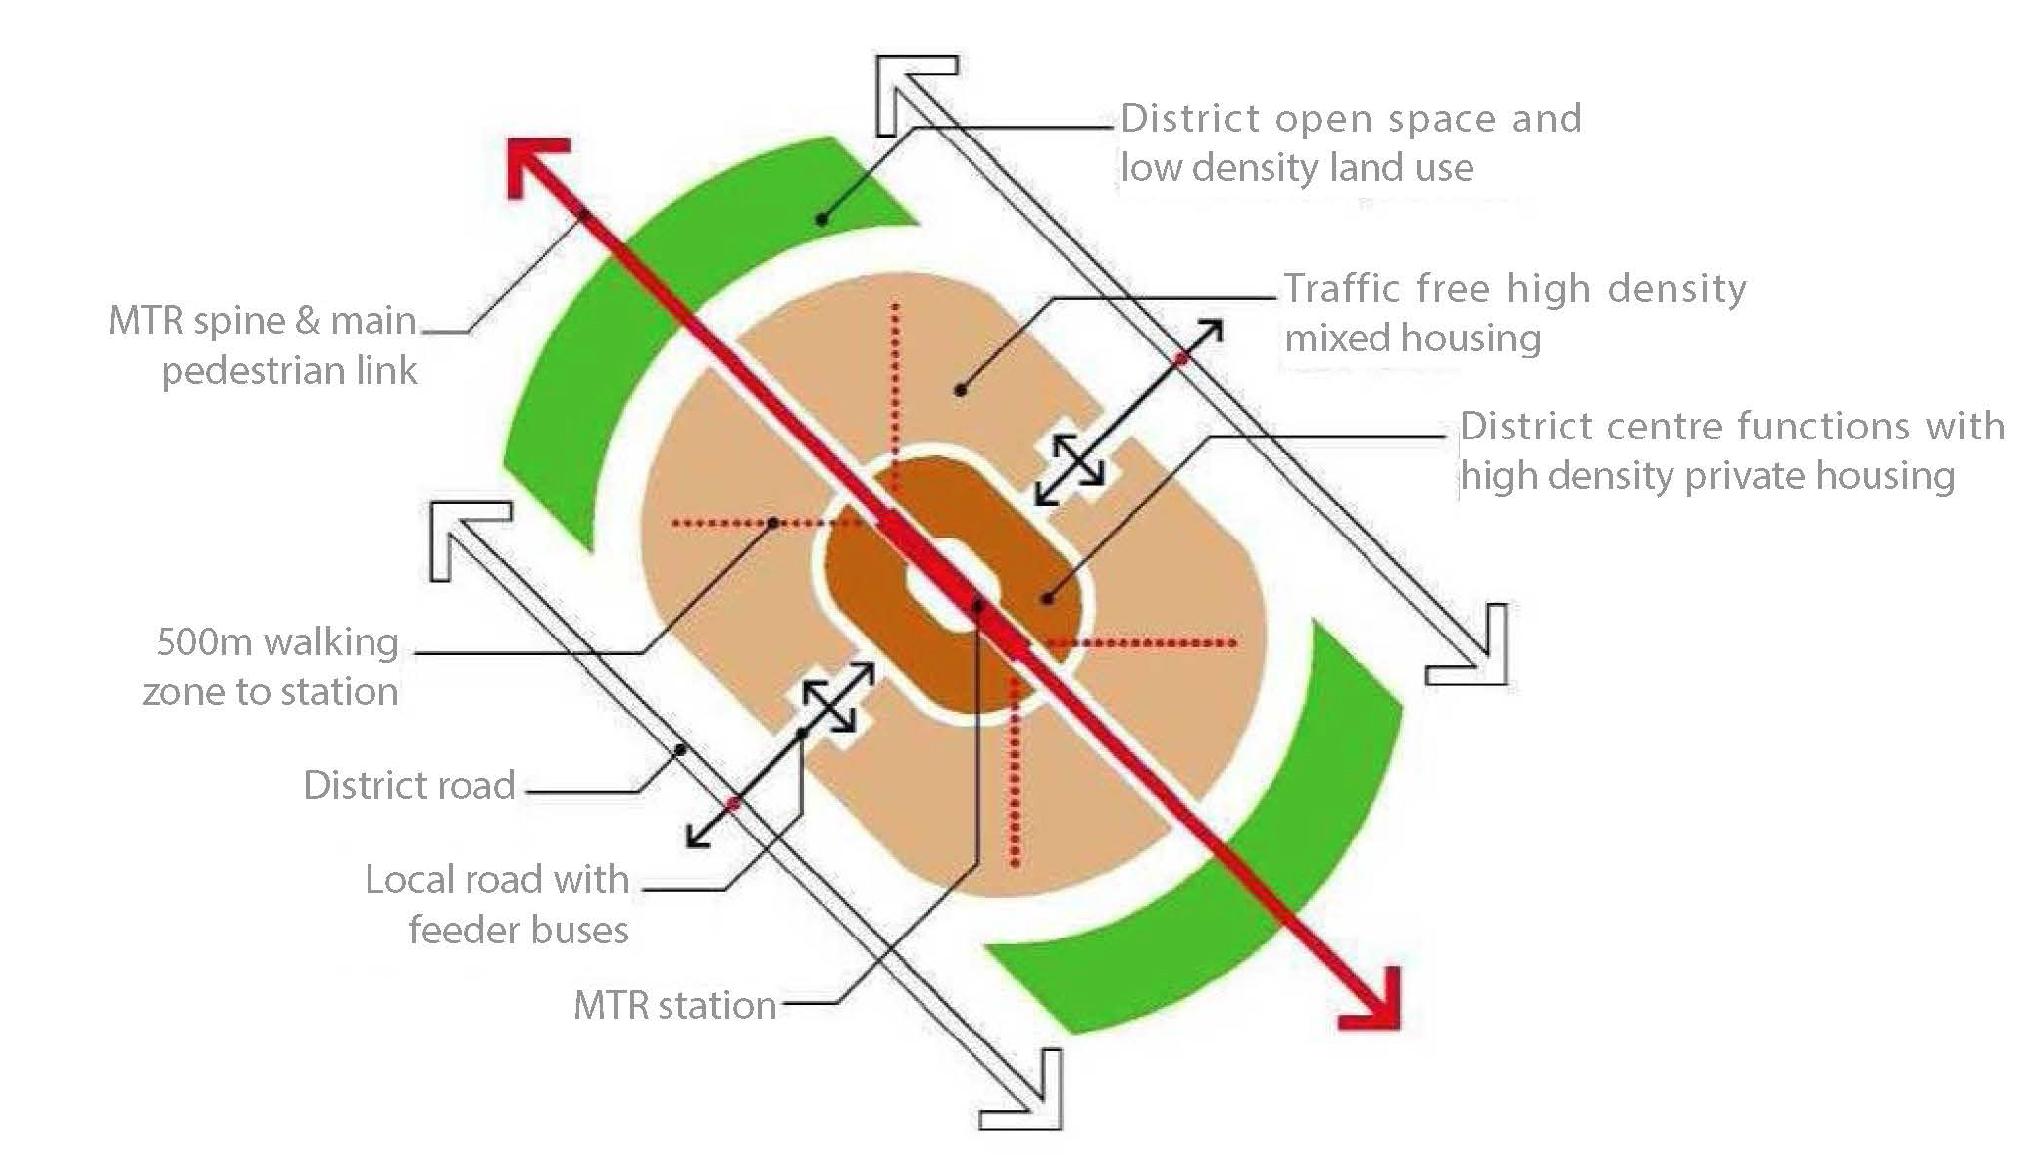 Deconstructing Hong Kong's Mtr Rail & Property Model